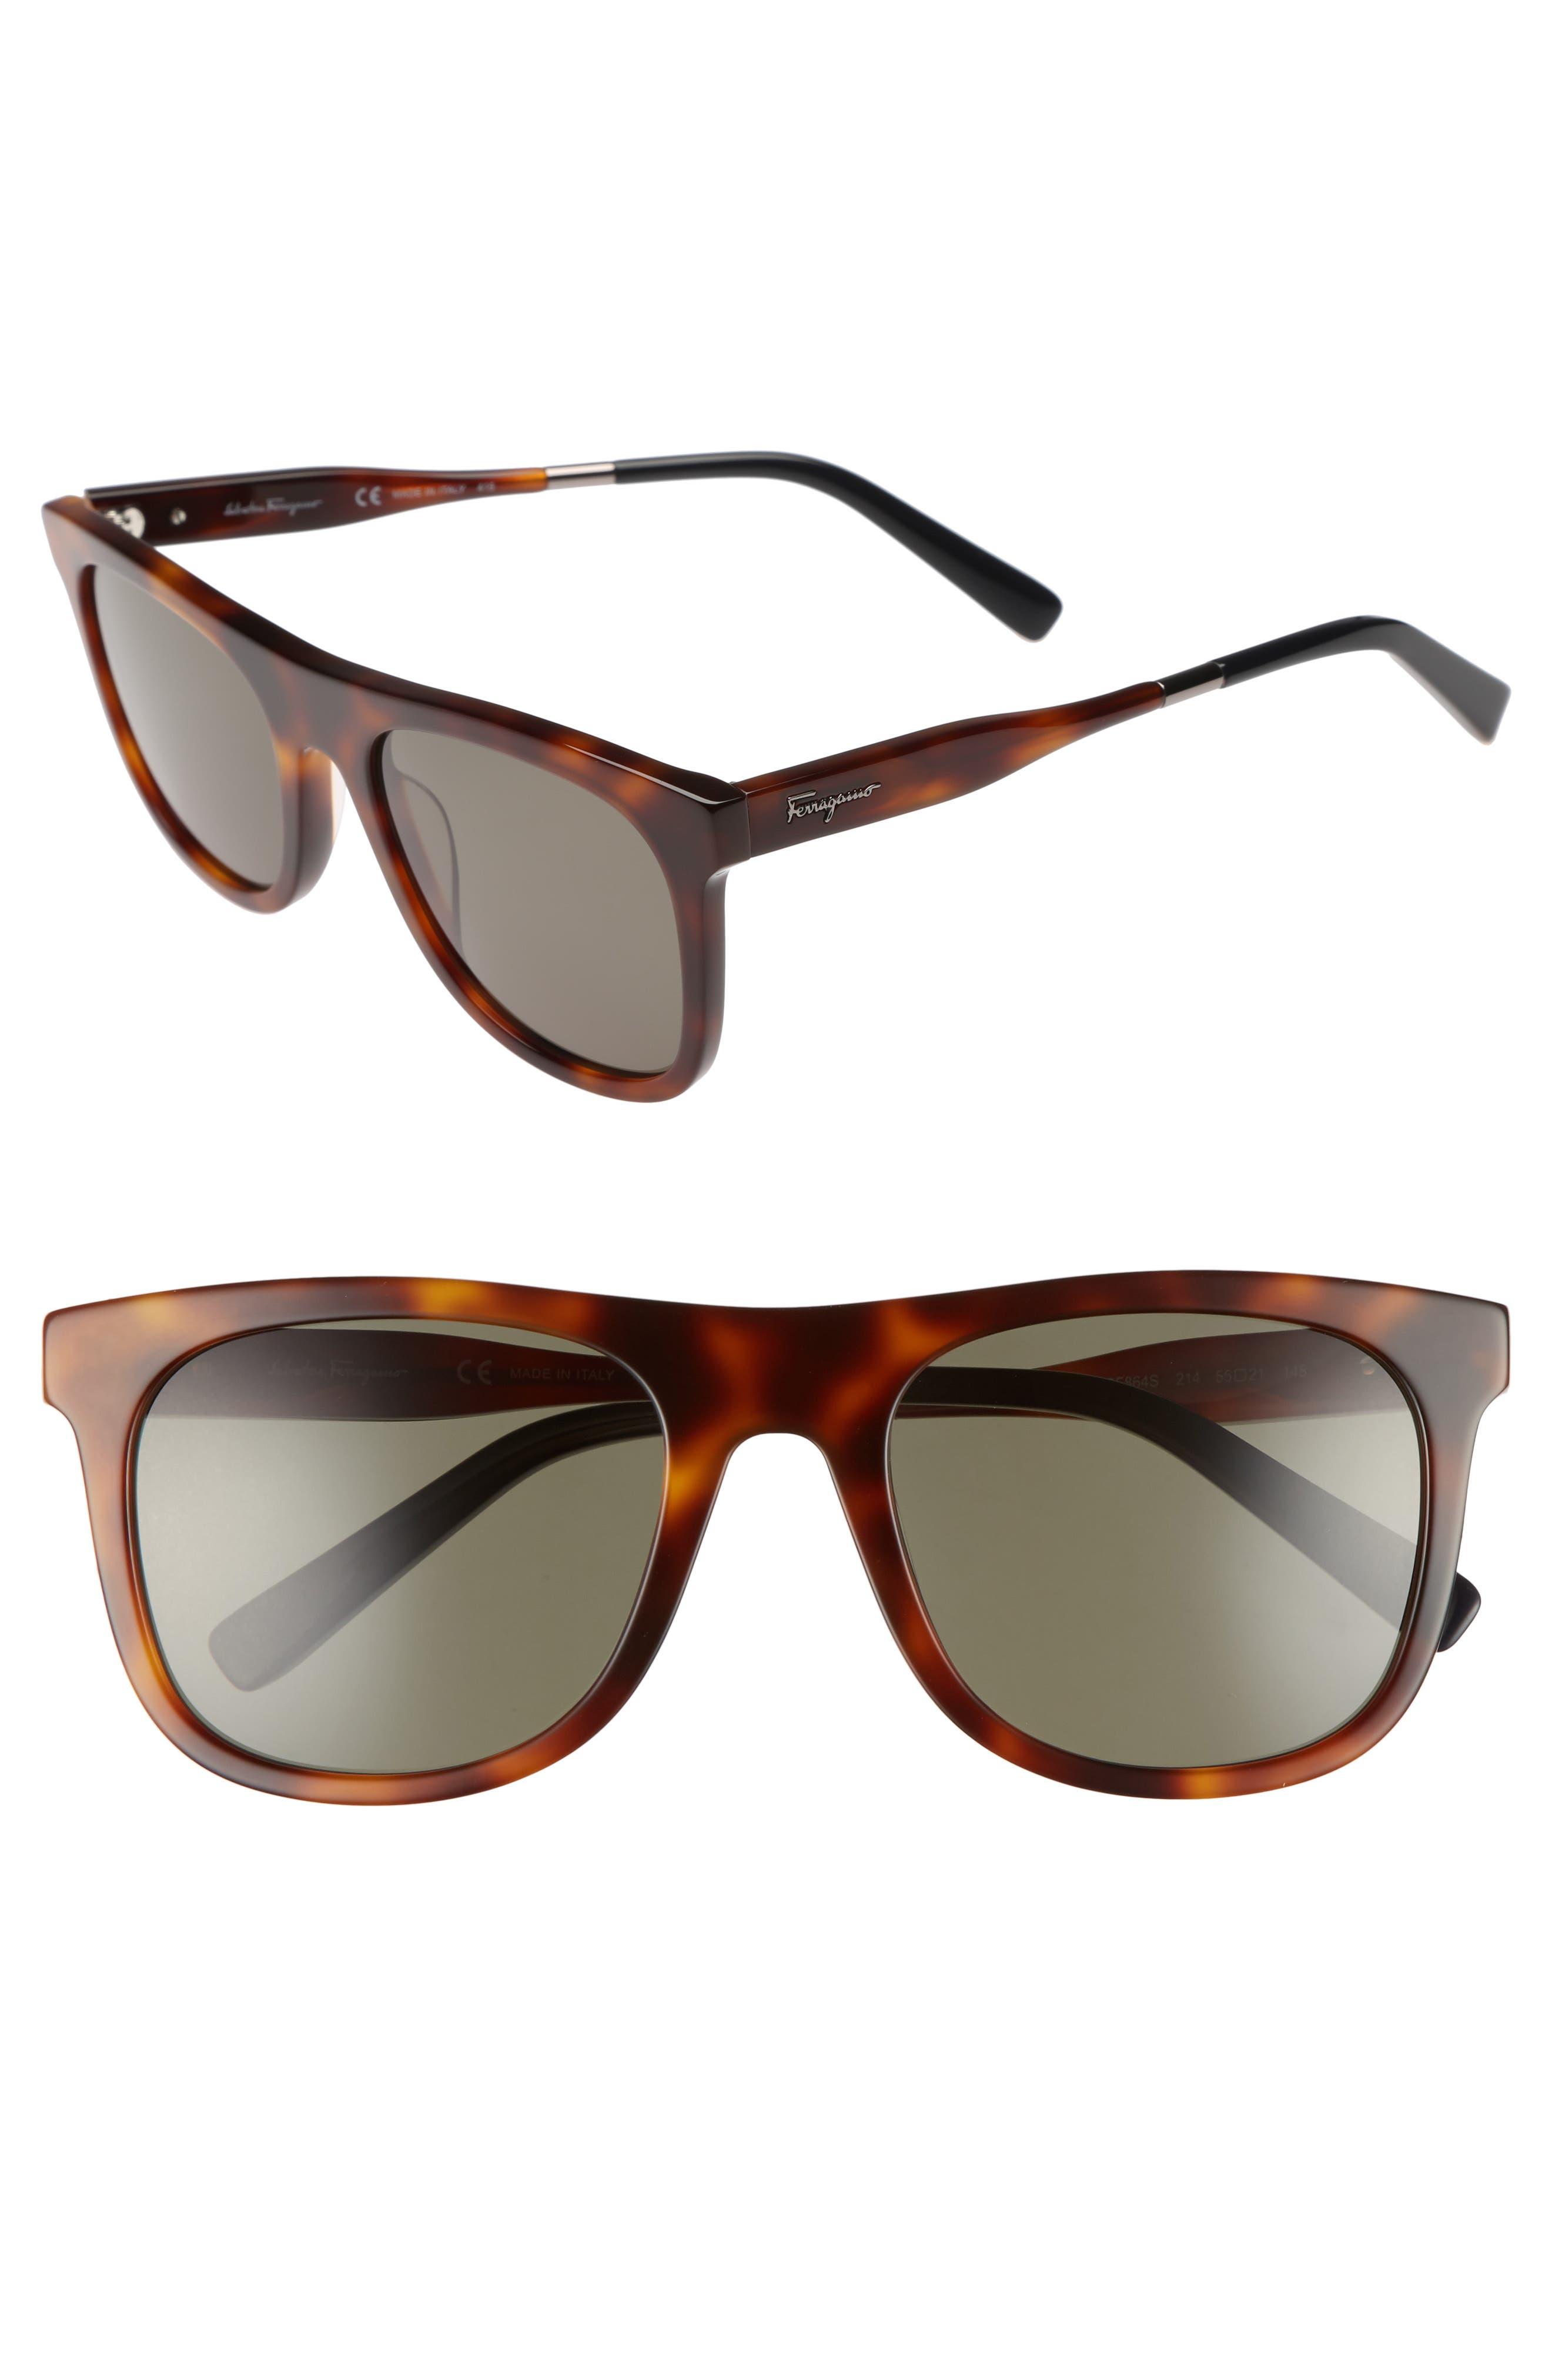 55mm Sunglasses,                         Main,                         color, Tortoise